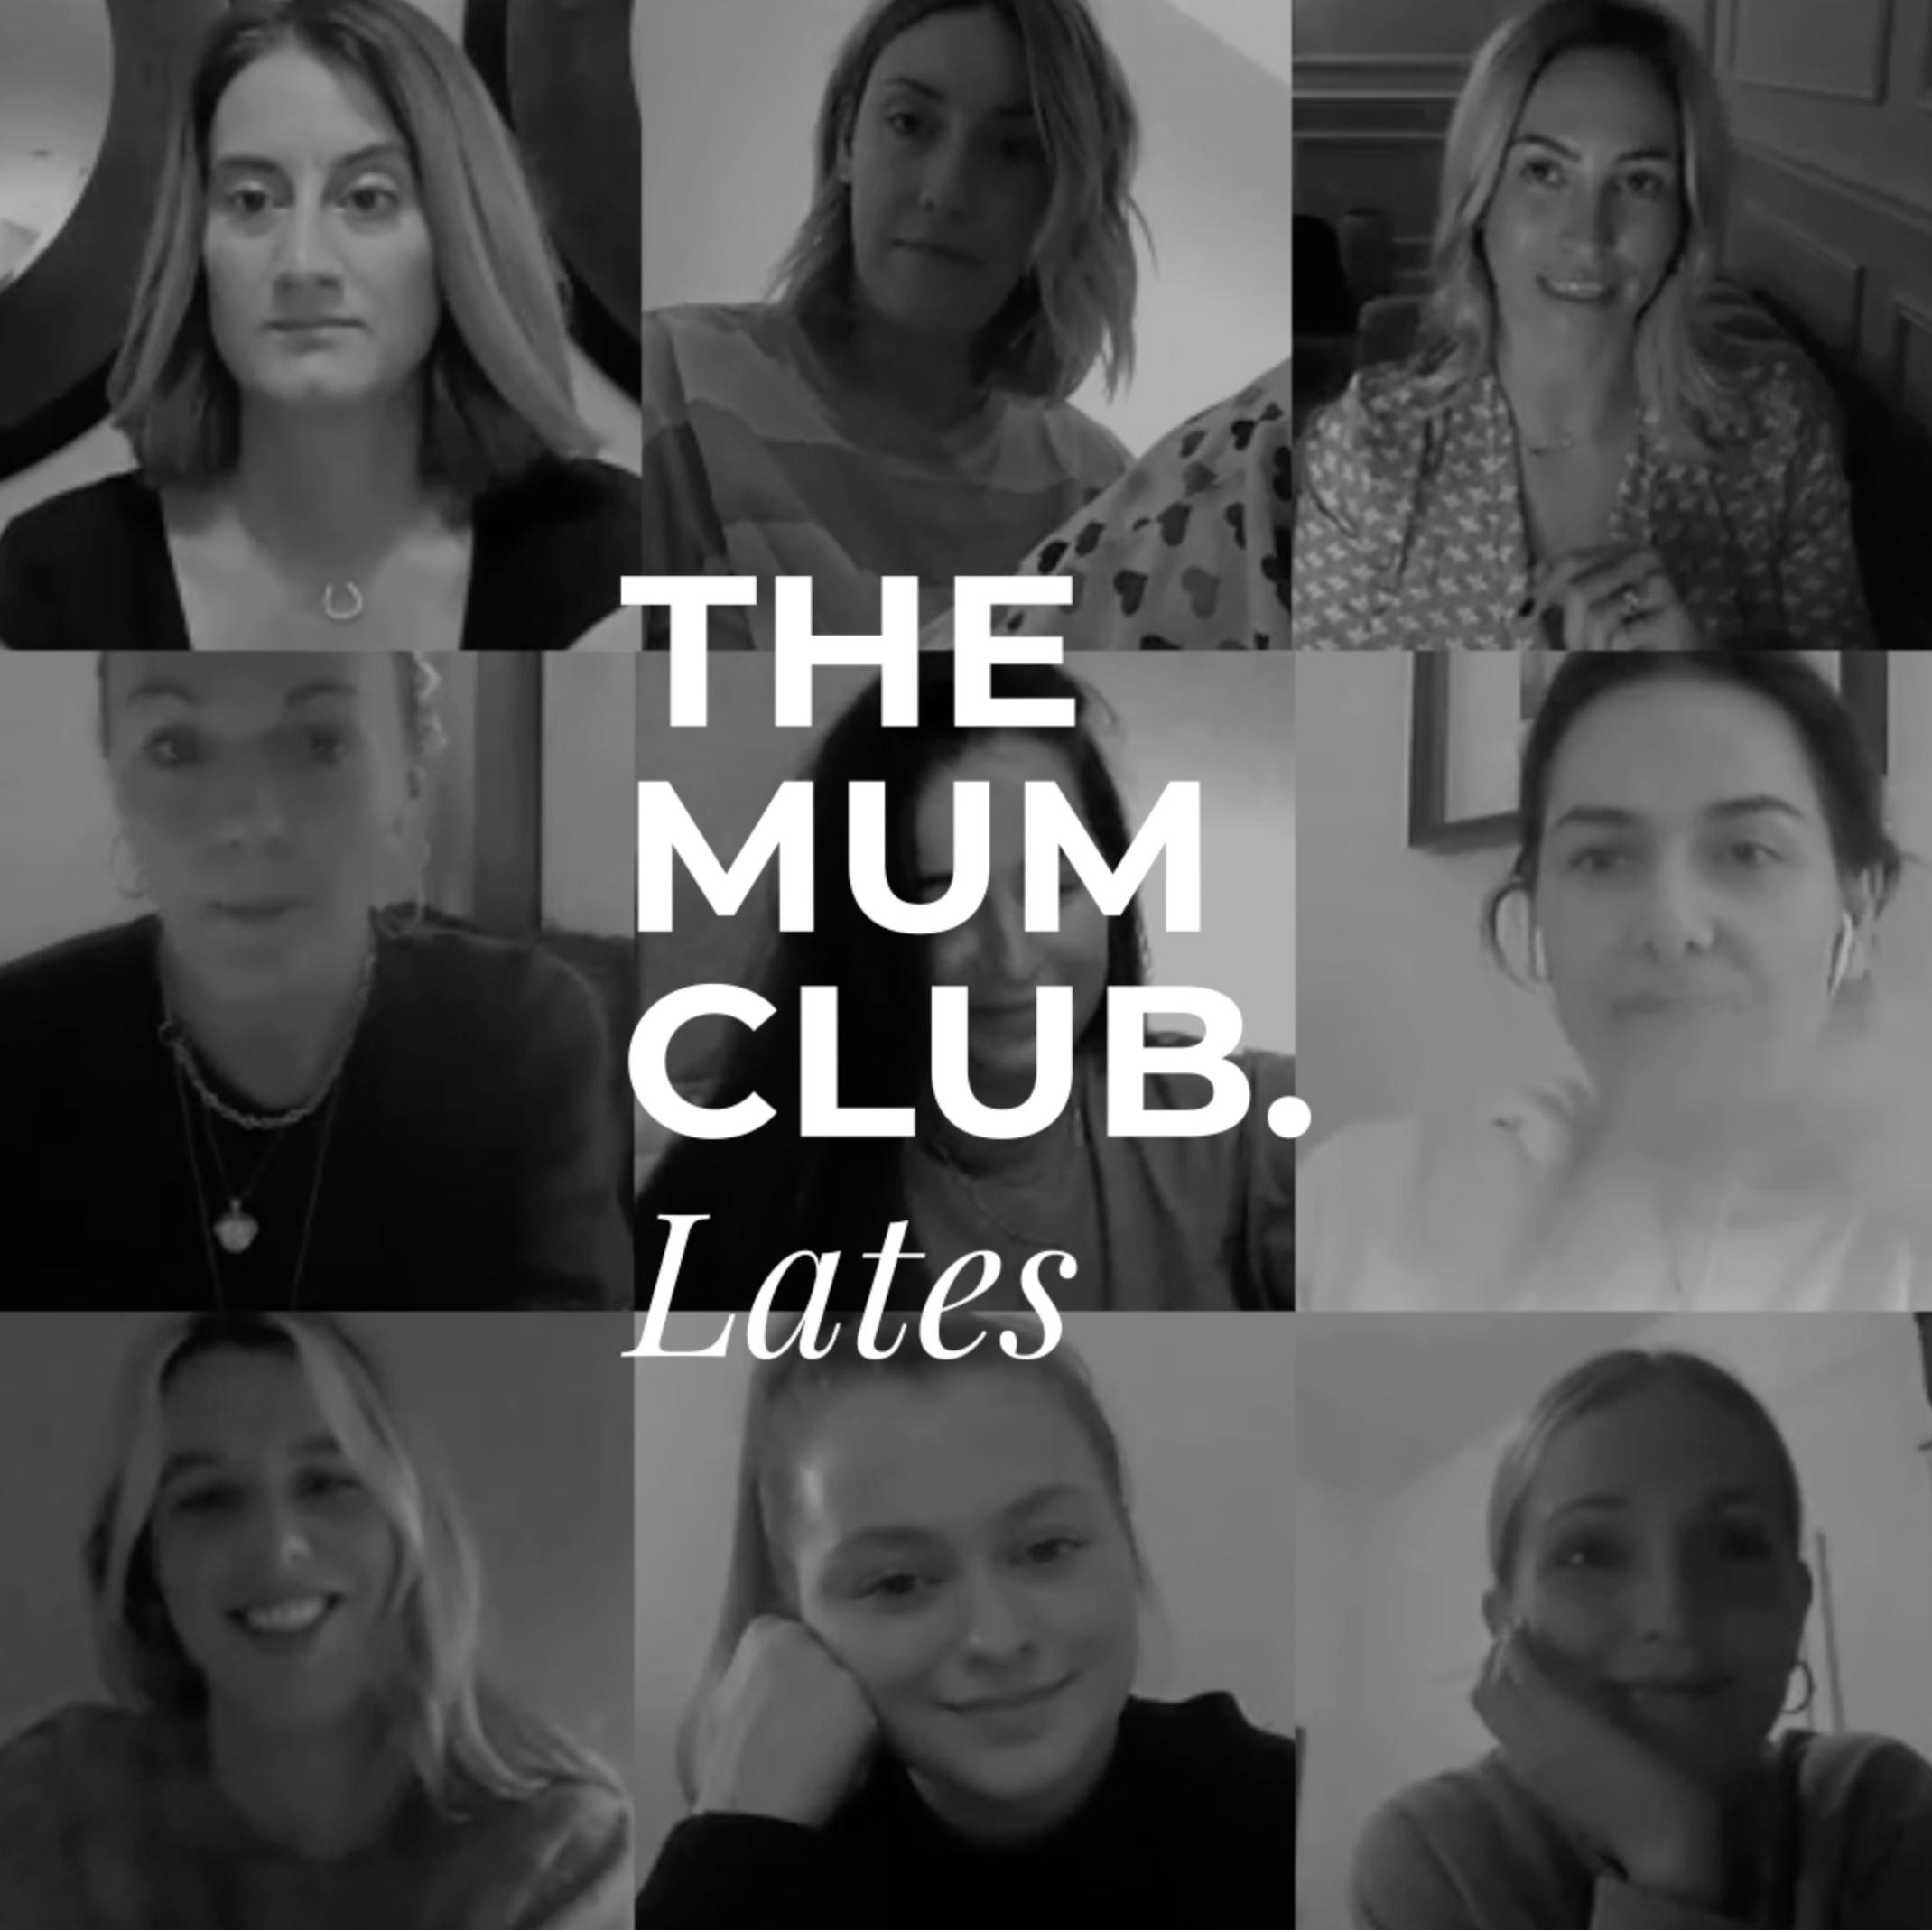 The Mum Club Lates